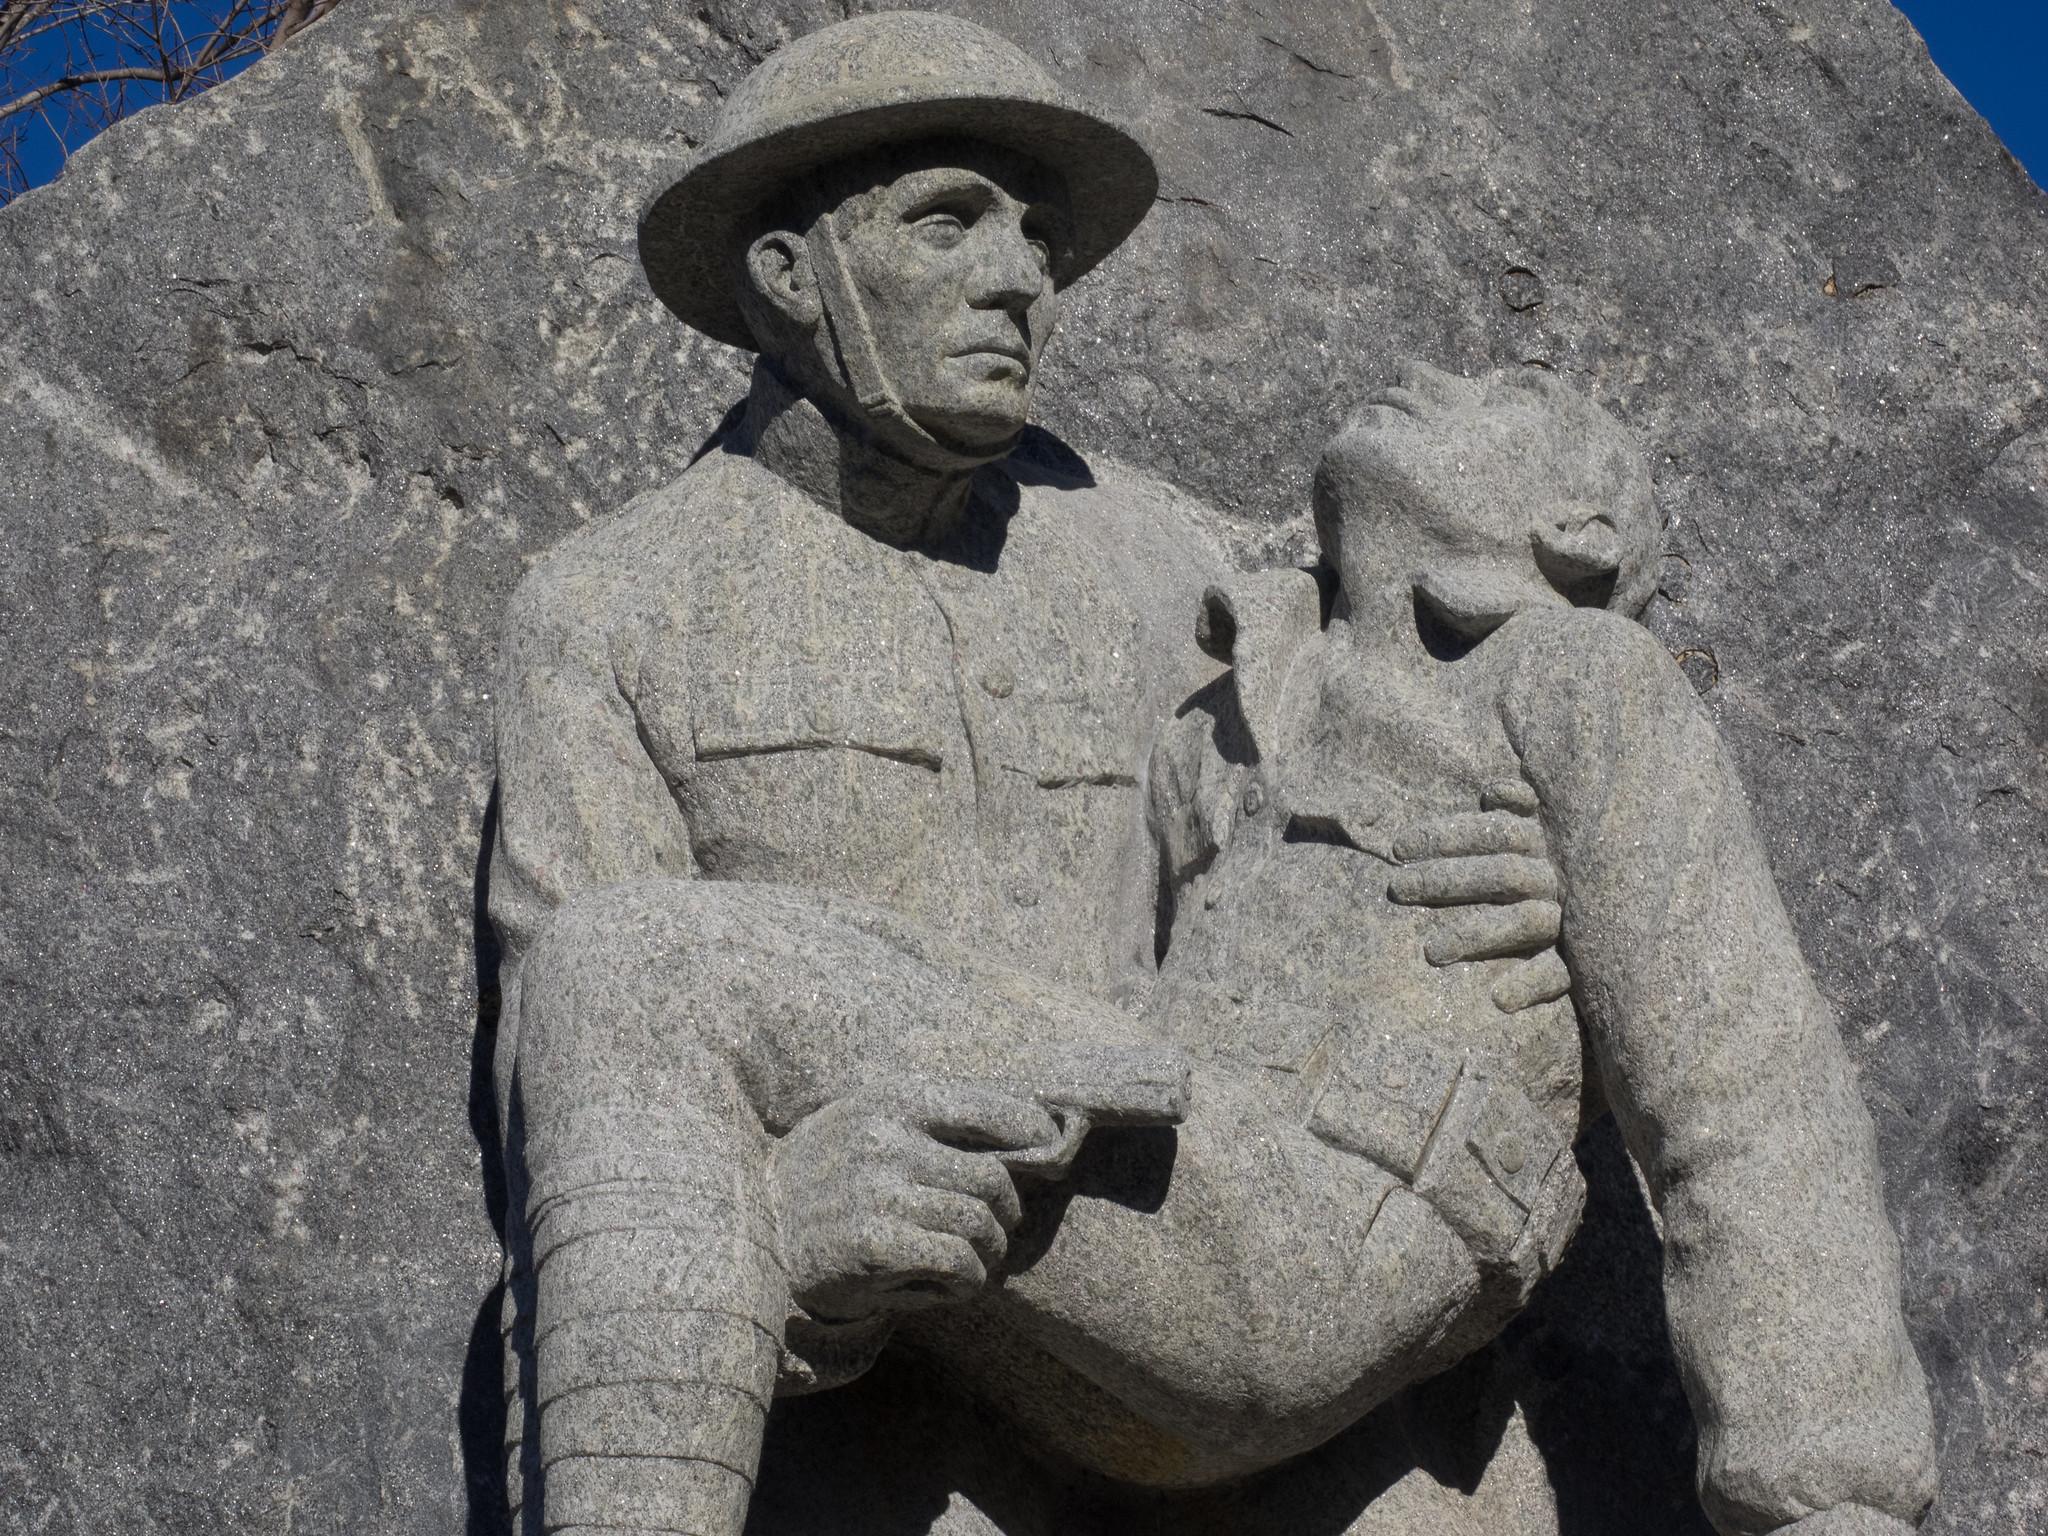 Buddies Sculpture